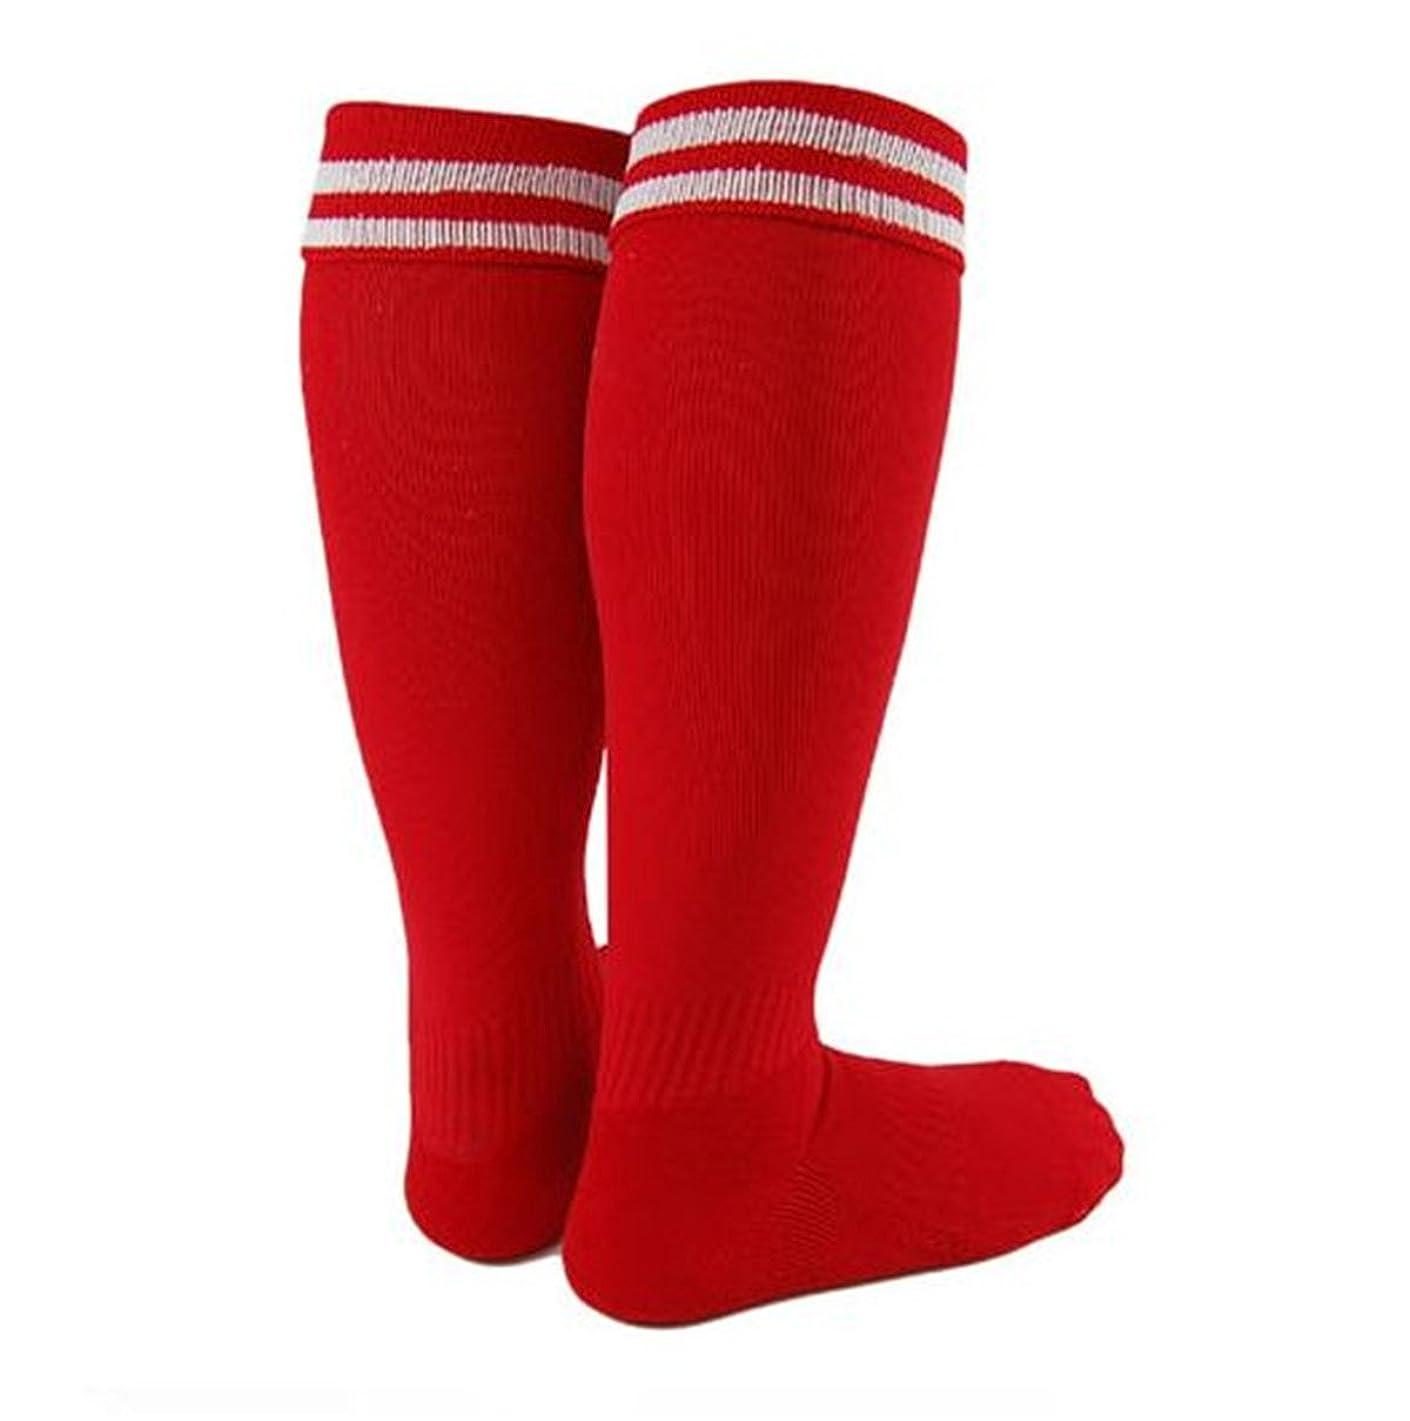 Lian LifeStyle Boy's 1 Pair Knee High Sports Socks for Baseball/Soccer/Lacrosse XL002 S Red